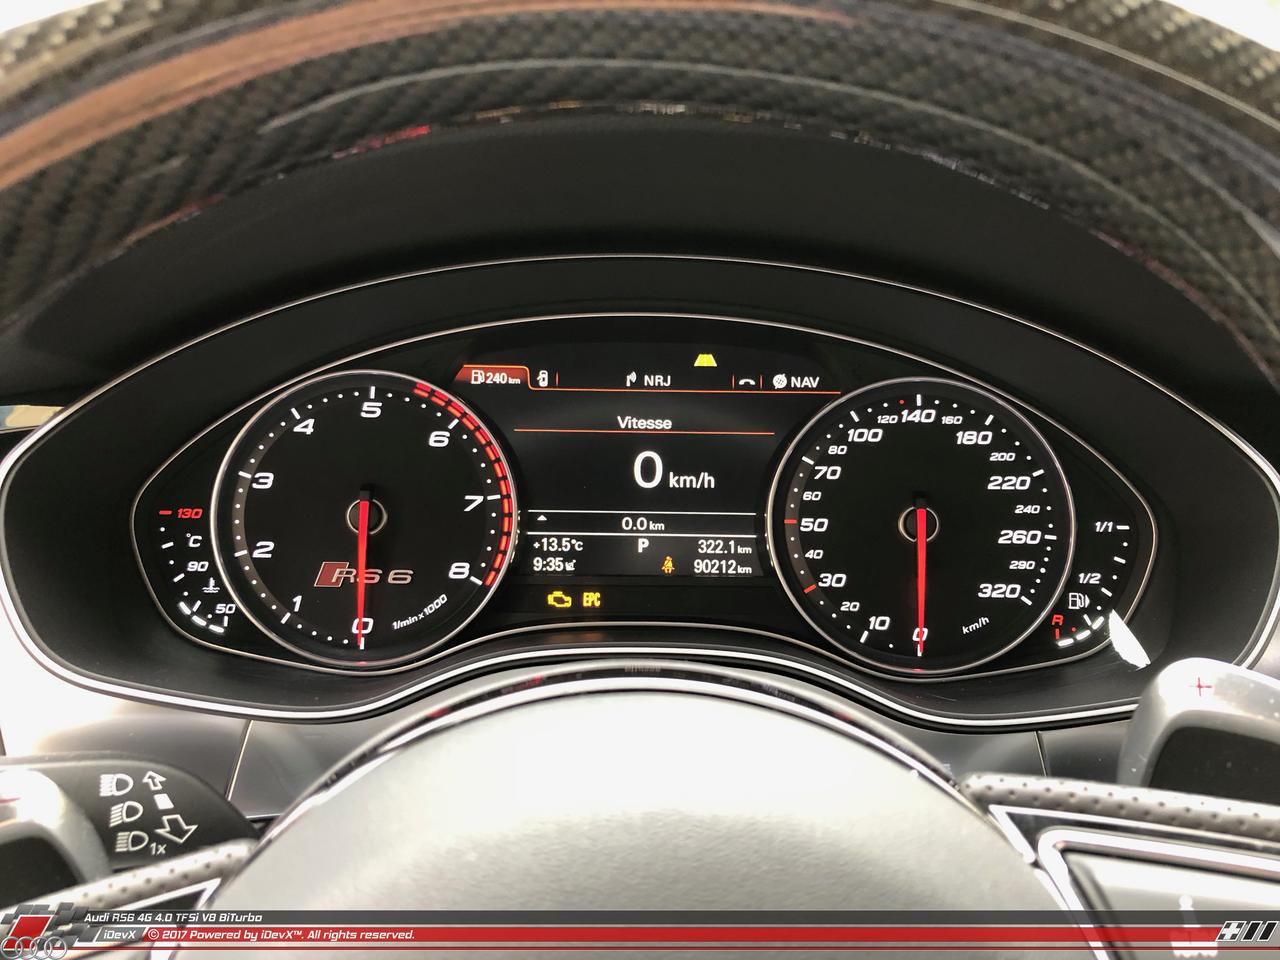 10_11.2018_Audi-RS6_iDevX_016.png